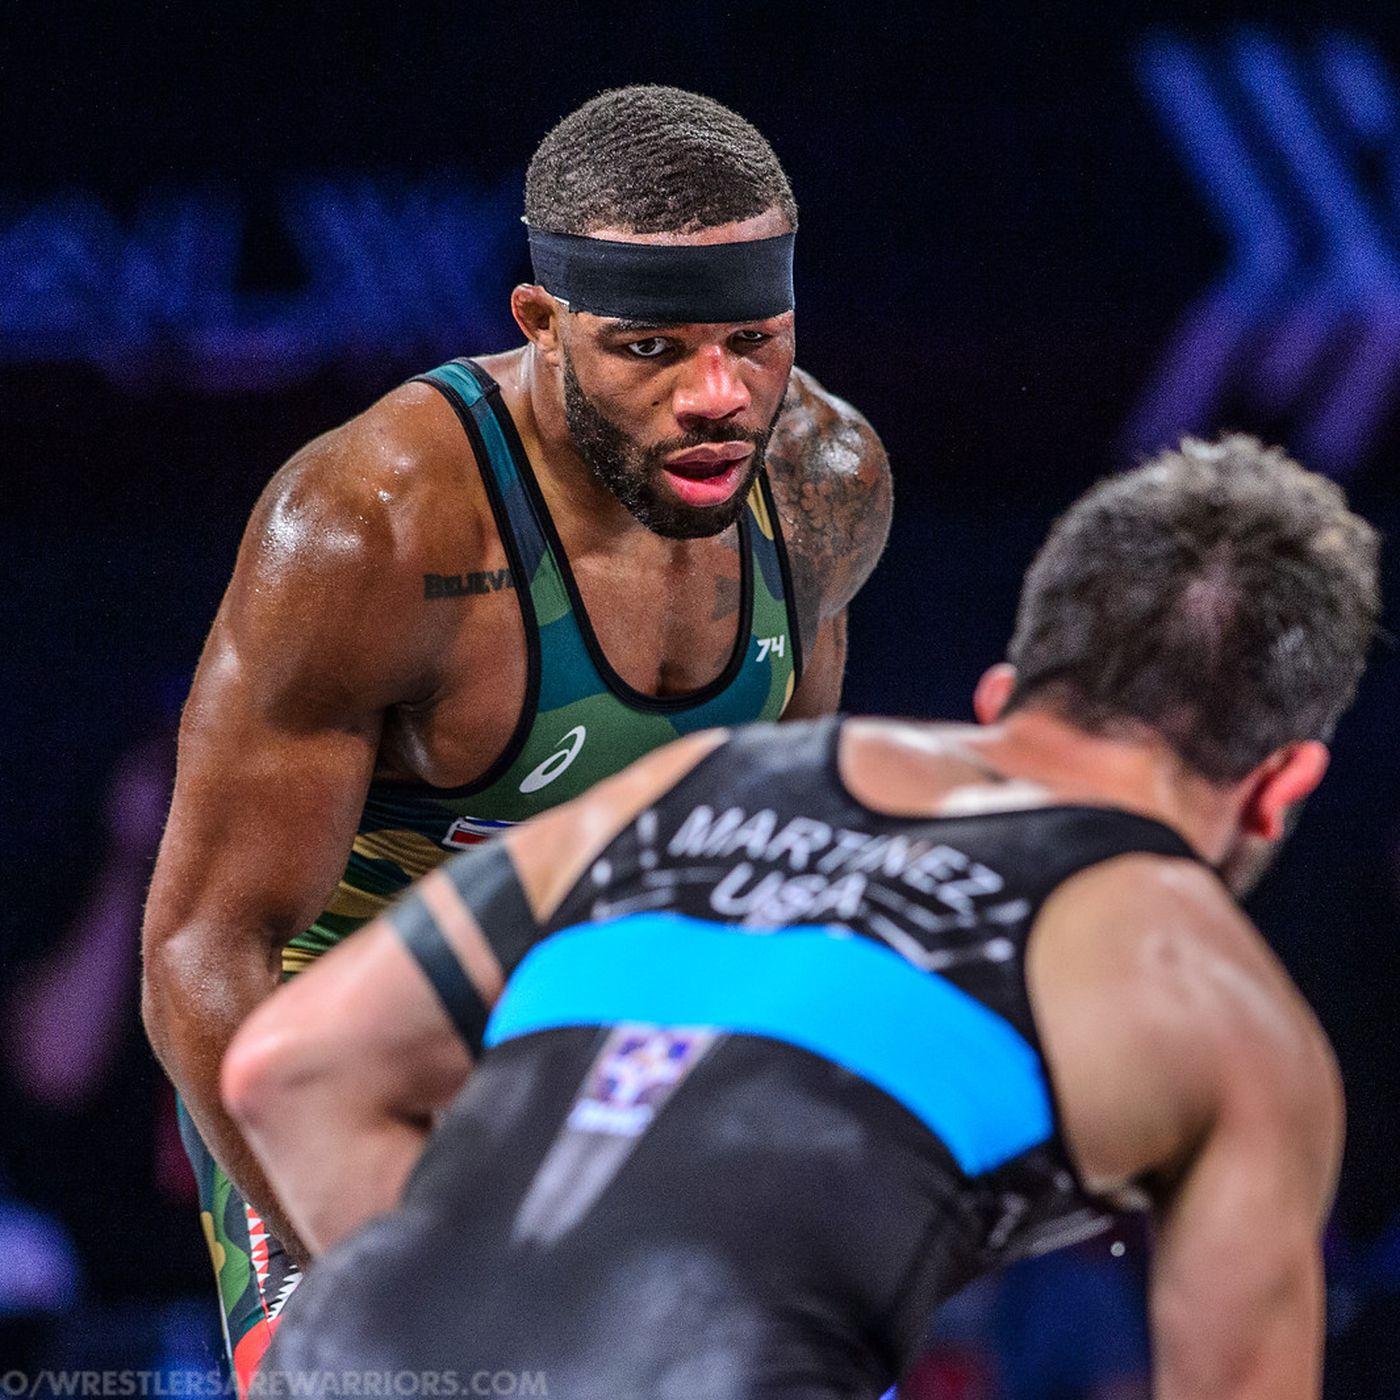 524601d1b2a Wrestling breakdown: How Jordan Burroughs denied Isaiah Martinez at ...